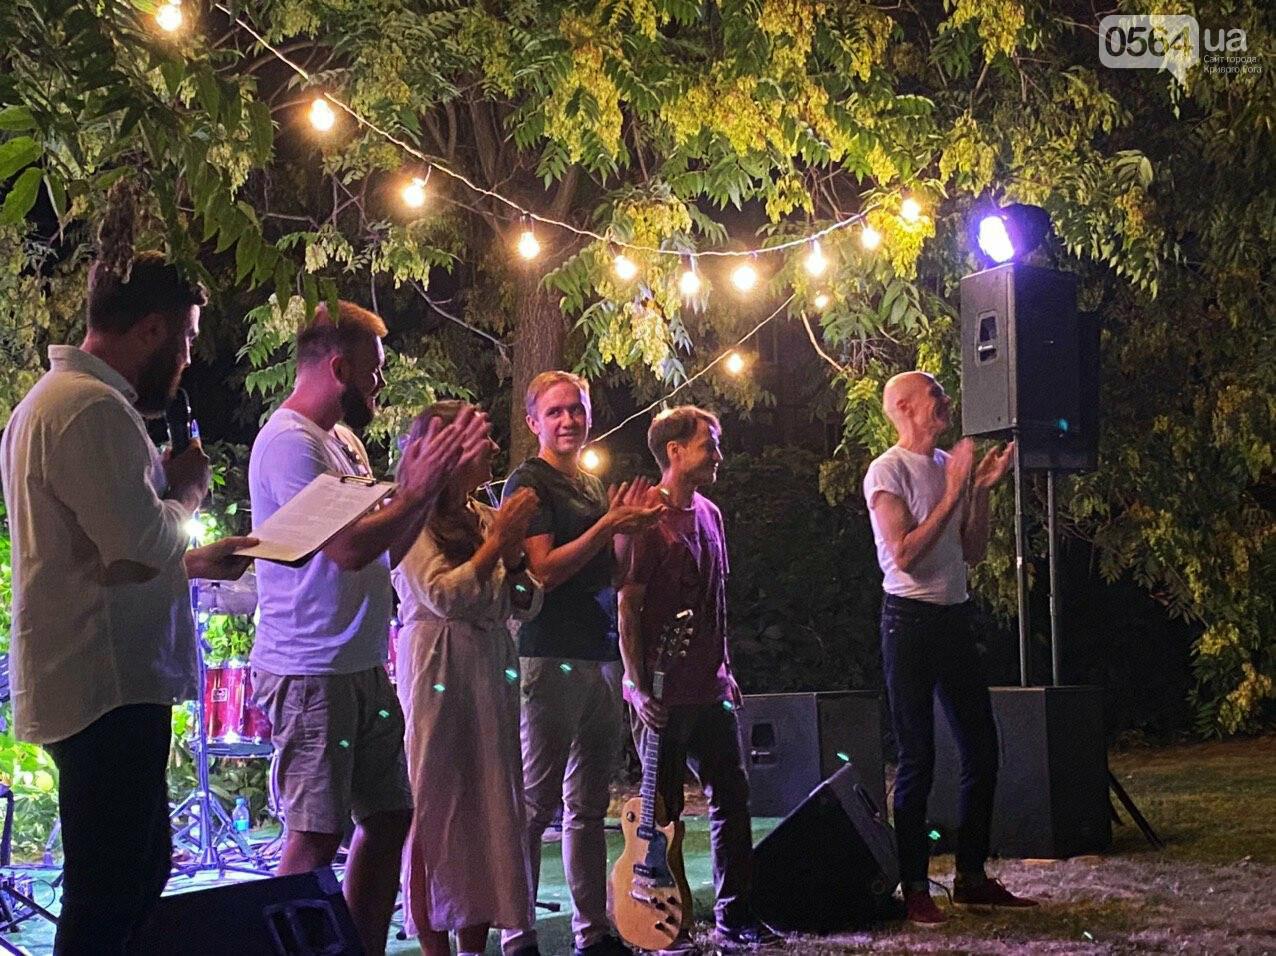 Под звездным небом криворожане наслаждались летним джазом от  Advantage Project, - ФОТО, ВИДЕО , фото-70